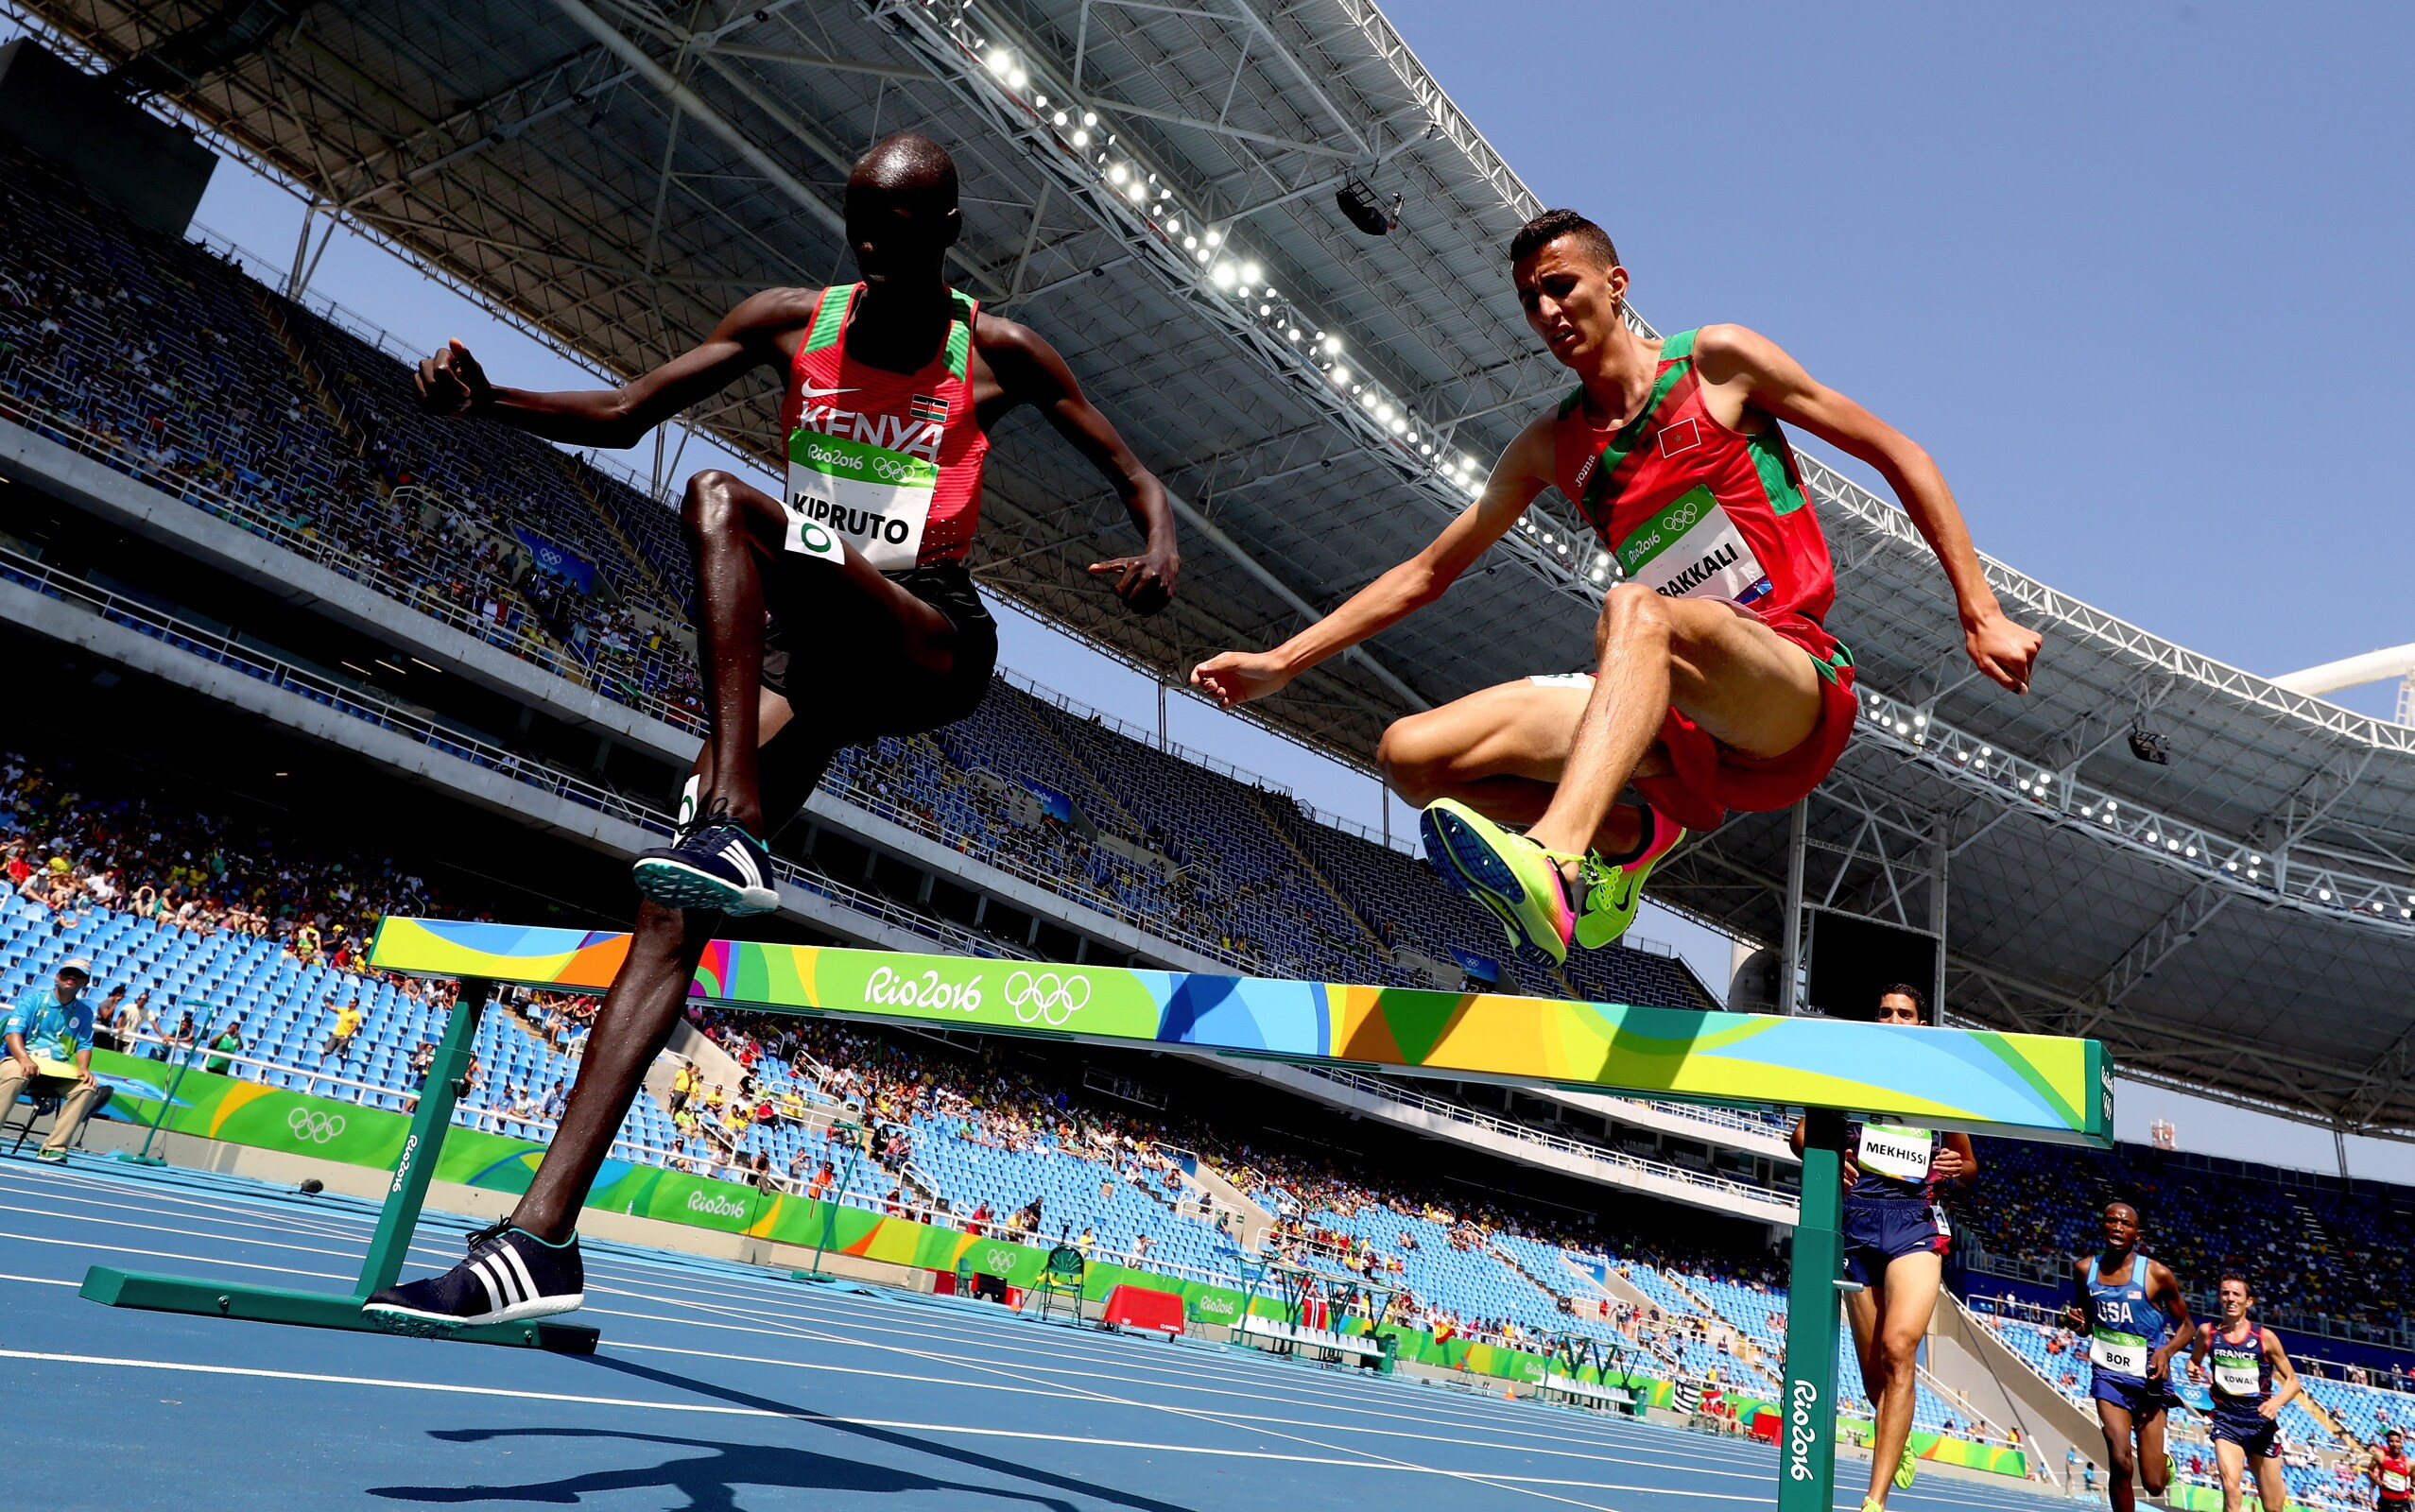 Athlétisme - 3000m steeple hommes